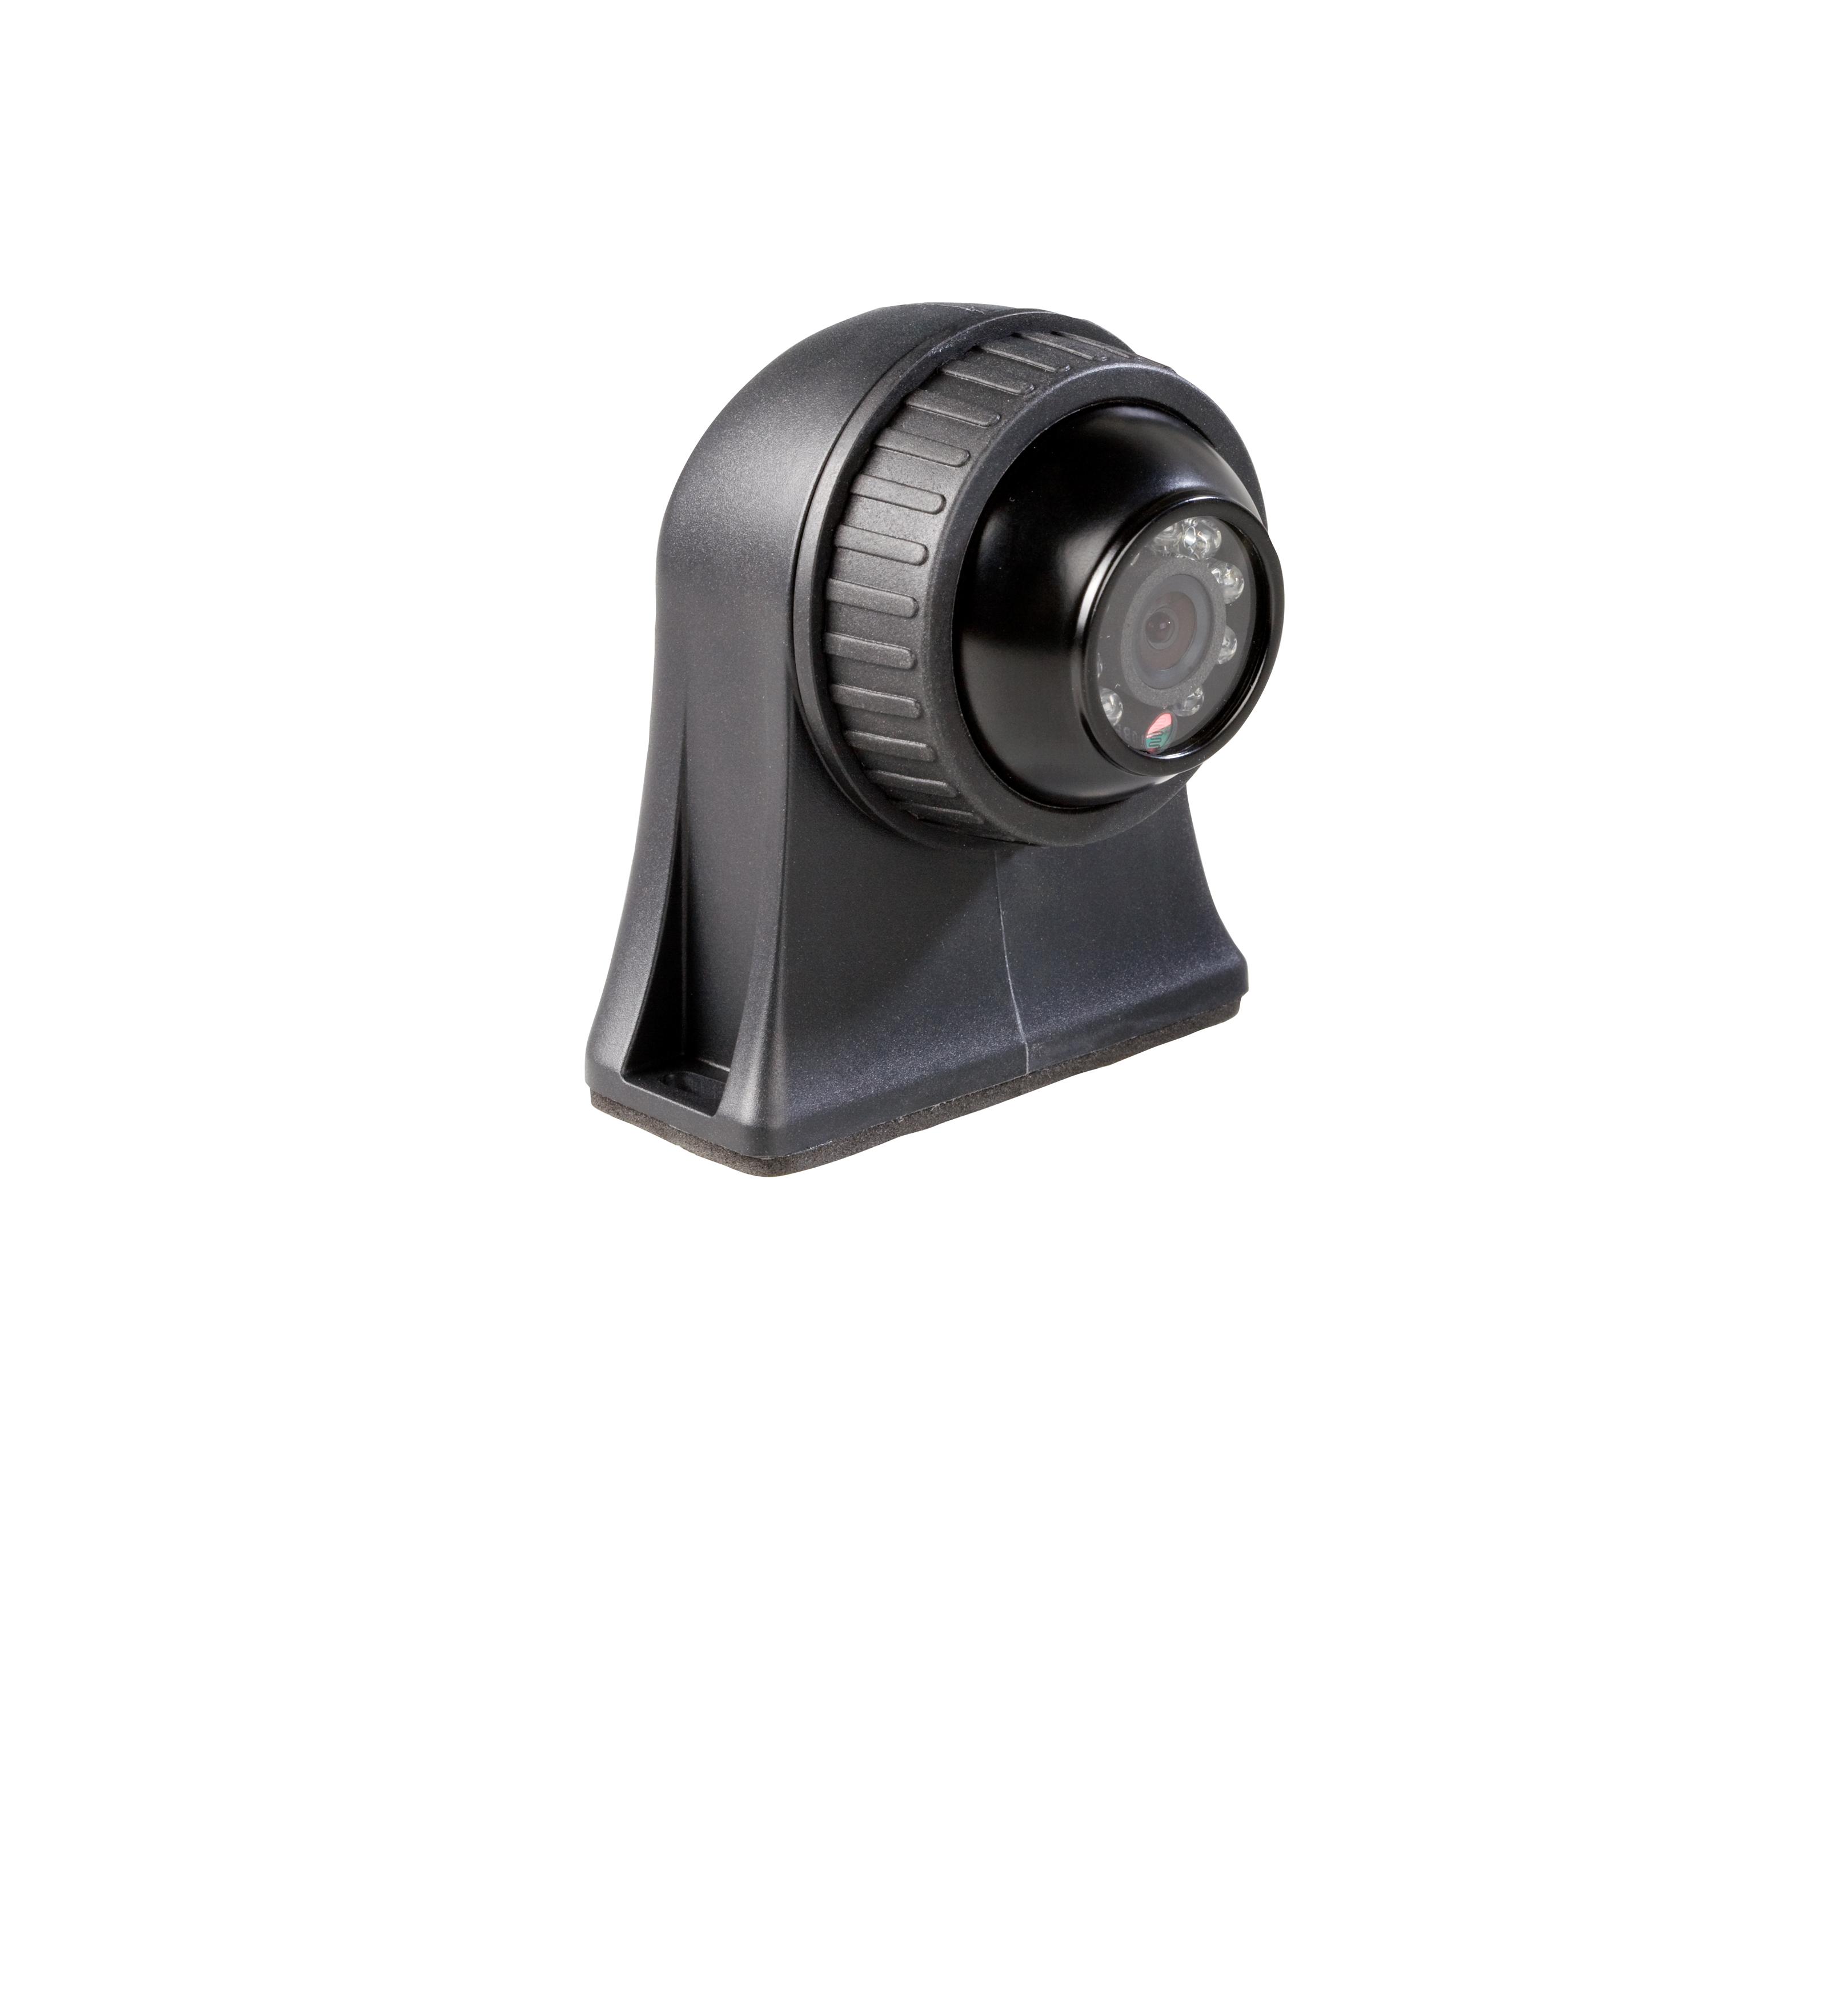 Compact Ball Type Camera